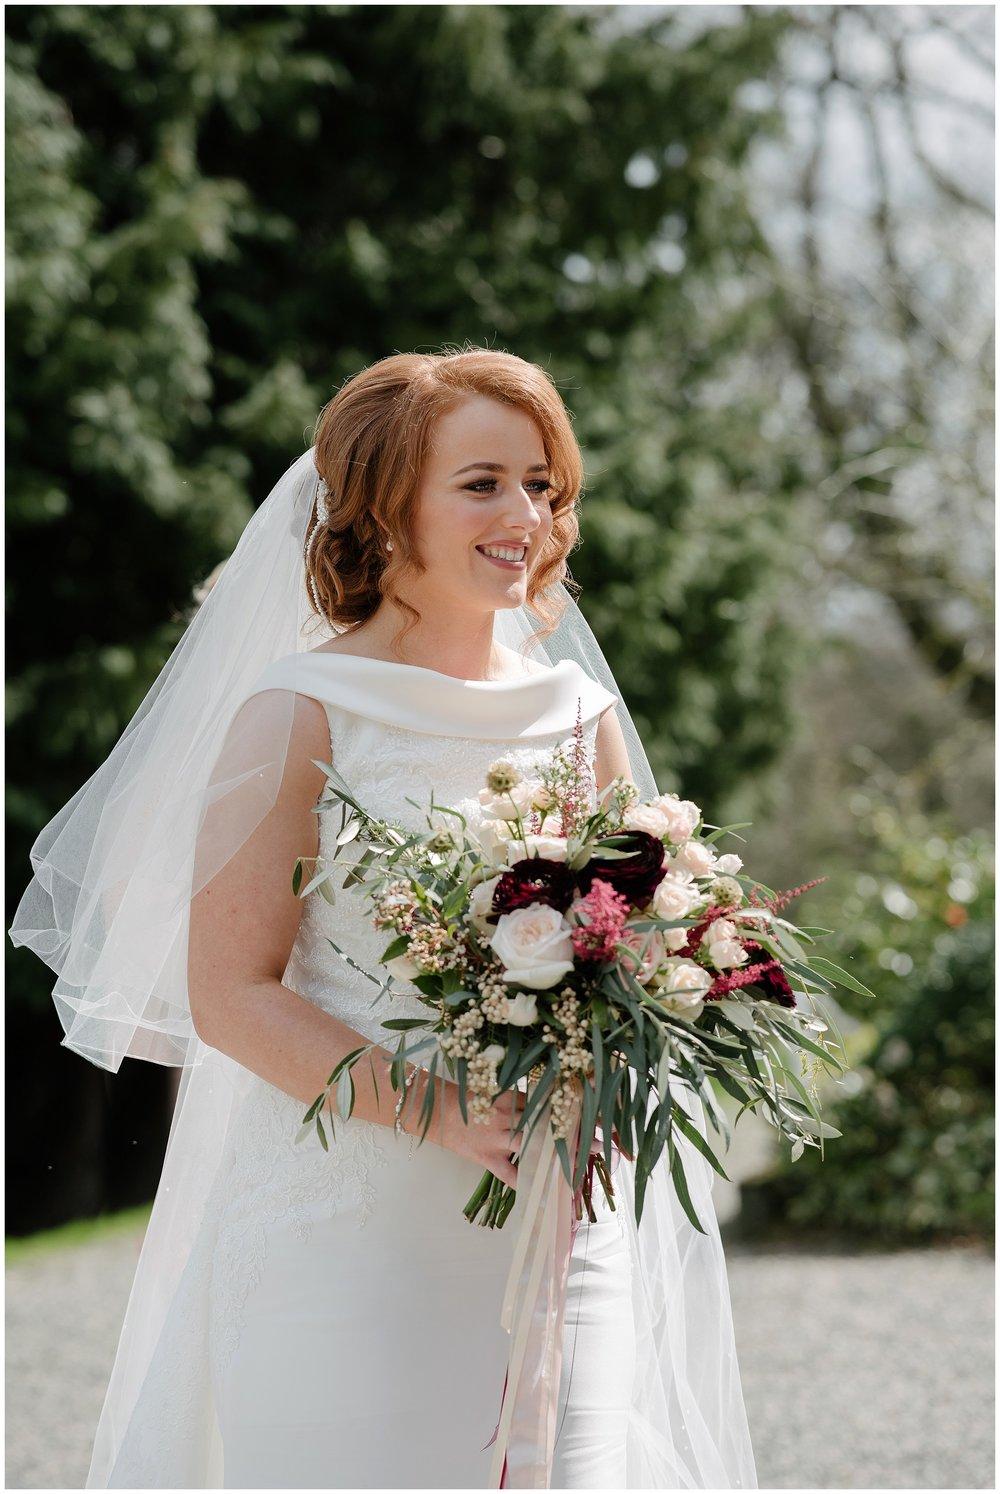 corick-house-wedding-hannah-gary-jude-browne-photography_0027.jpg